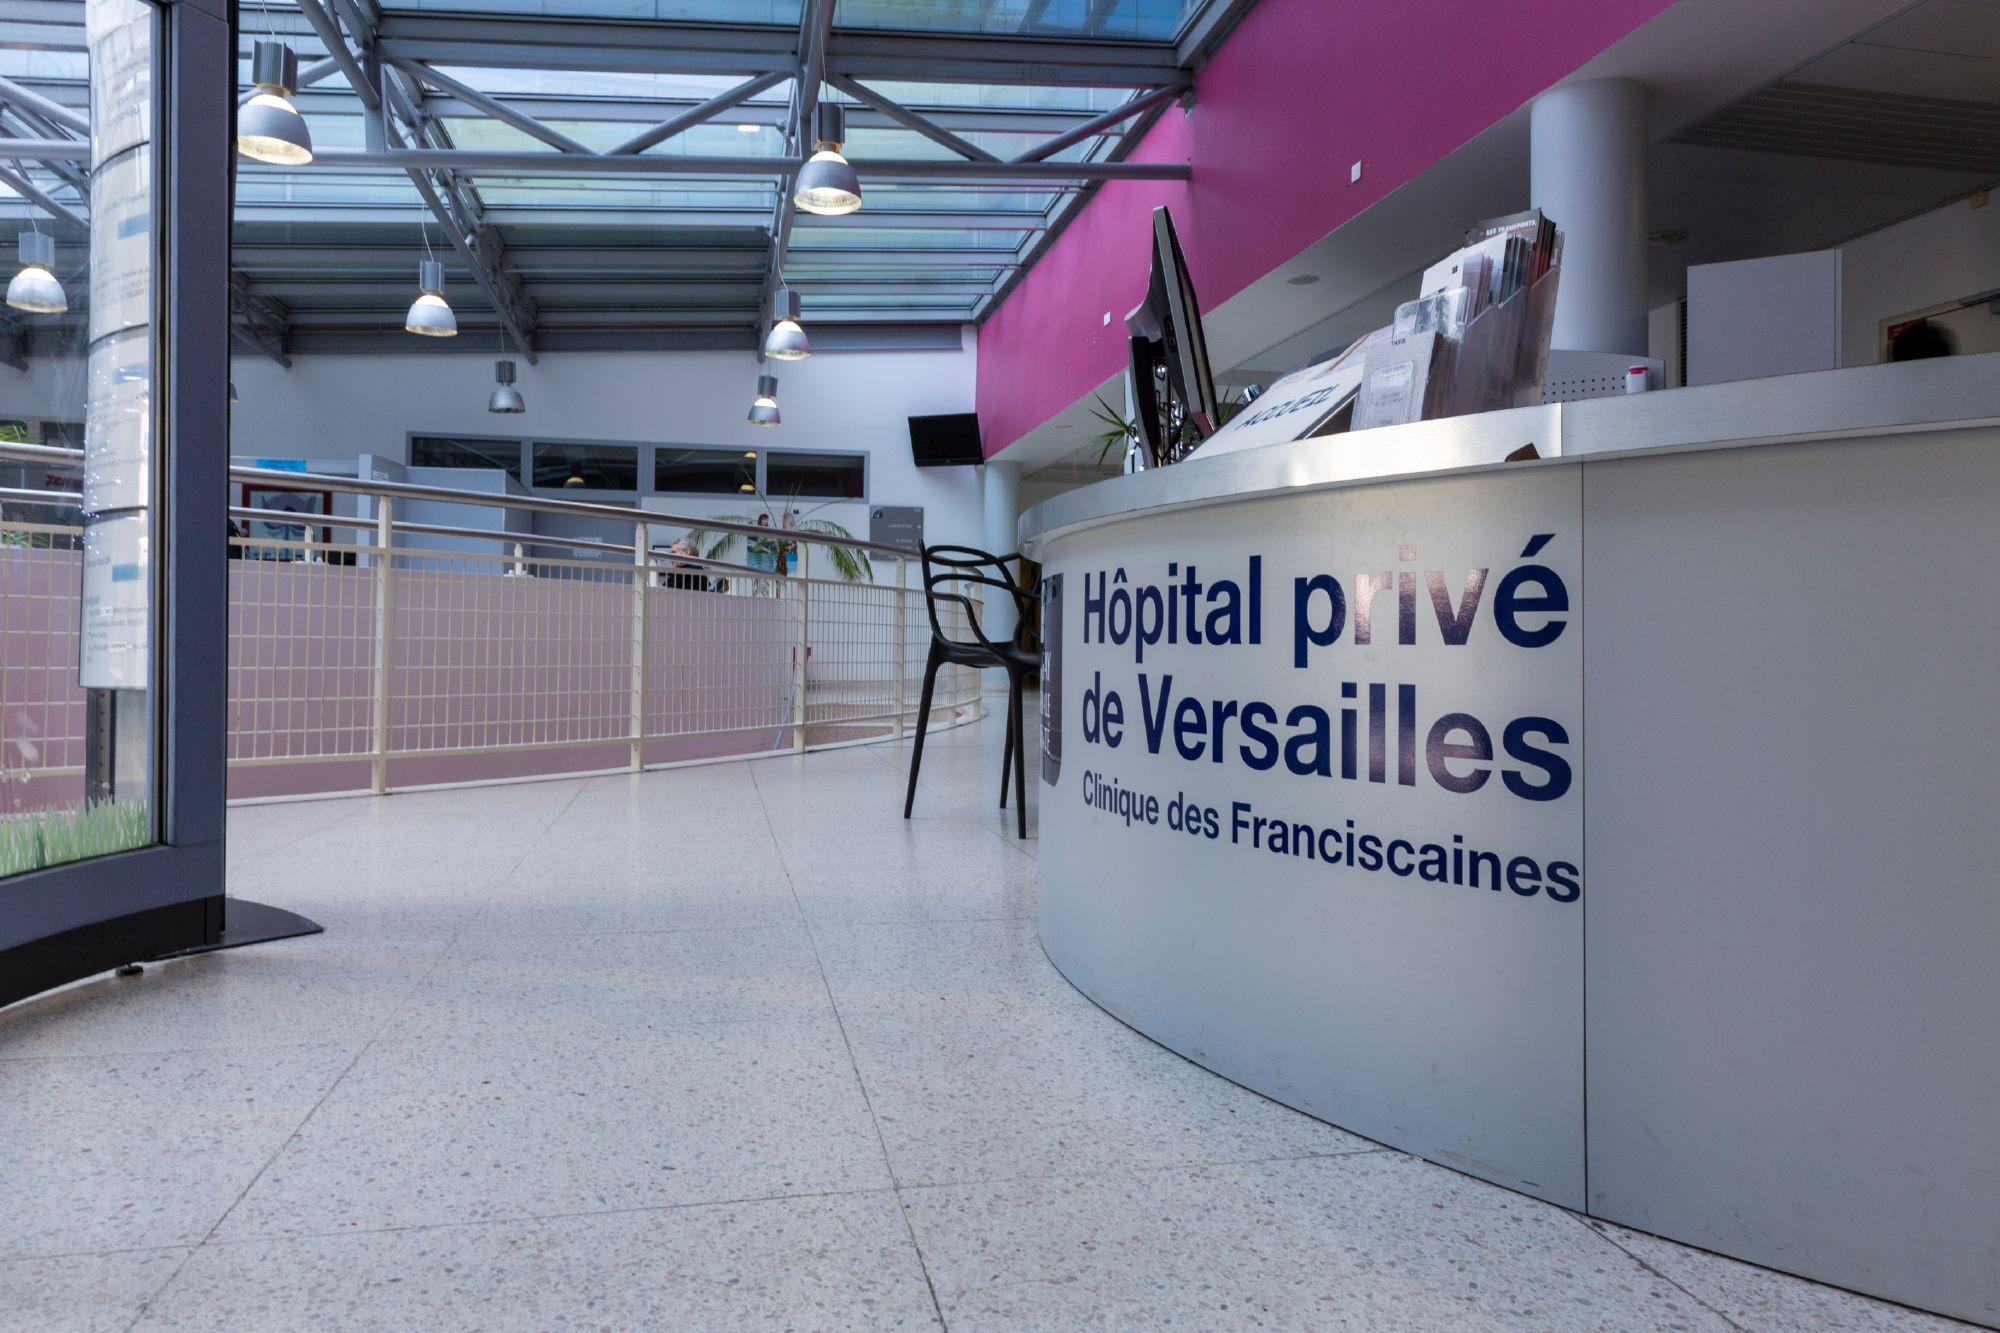 CRTT Versailles - Imagerie médicale